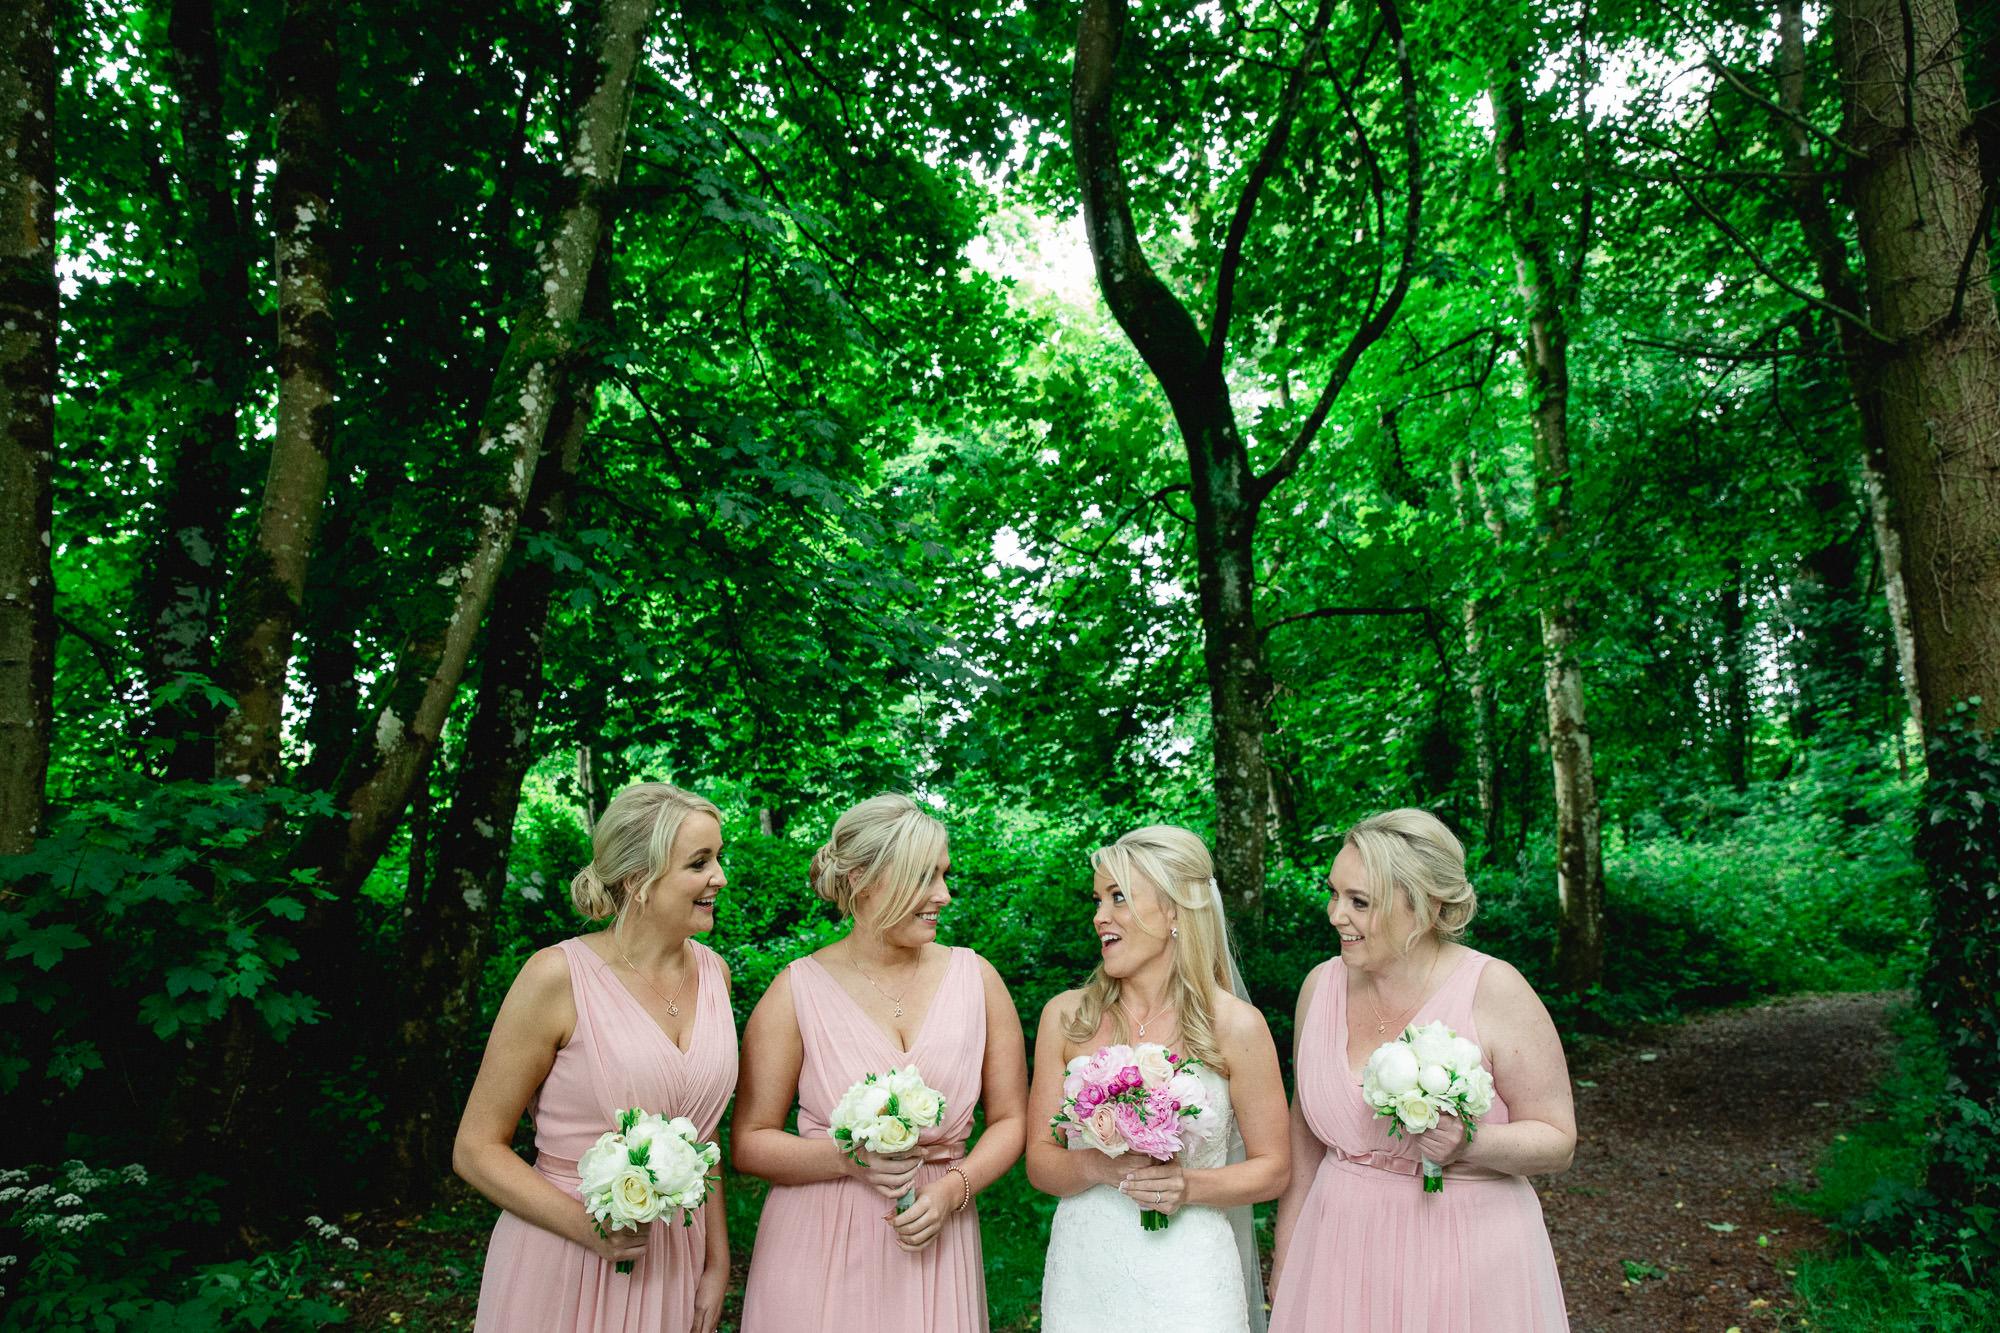 CLAIREBYRNEPHOTOGRAPHY-WEDDING-Ireland-tulffaris-alternative-fun-Lisa-terry-10.jpg